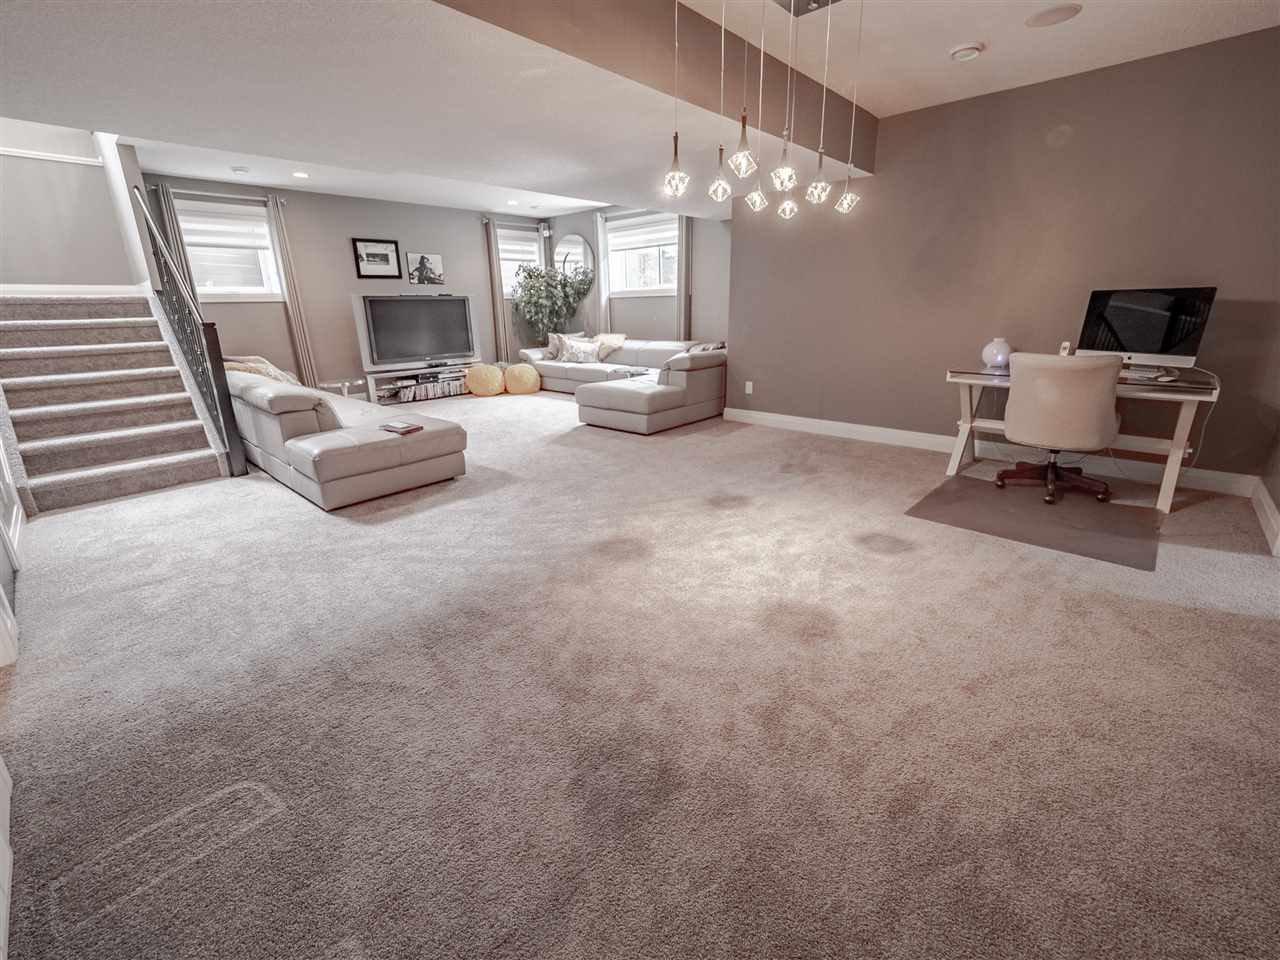 Photo 28: Photos: 58 Kenton Woods Lane NW: Spruce Grove House for sale : MLS®# E4166439